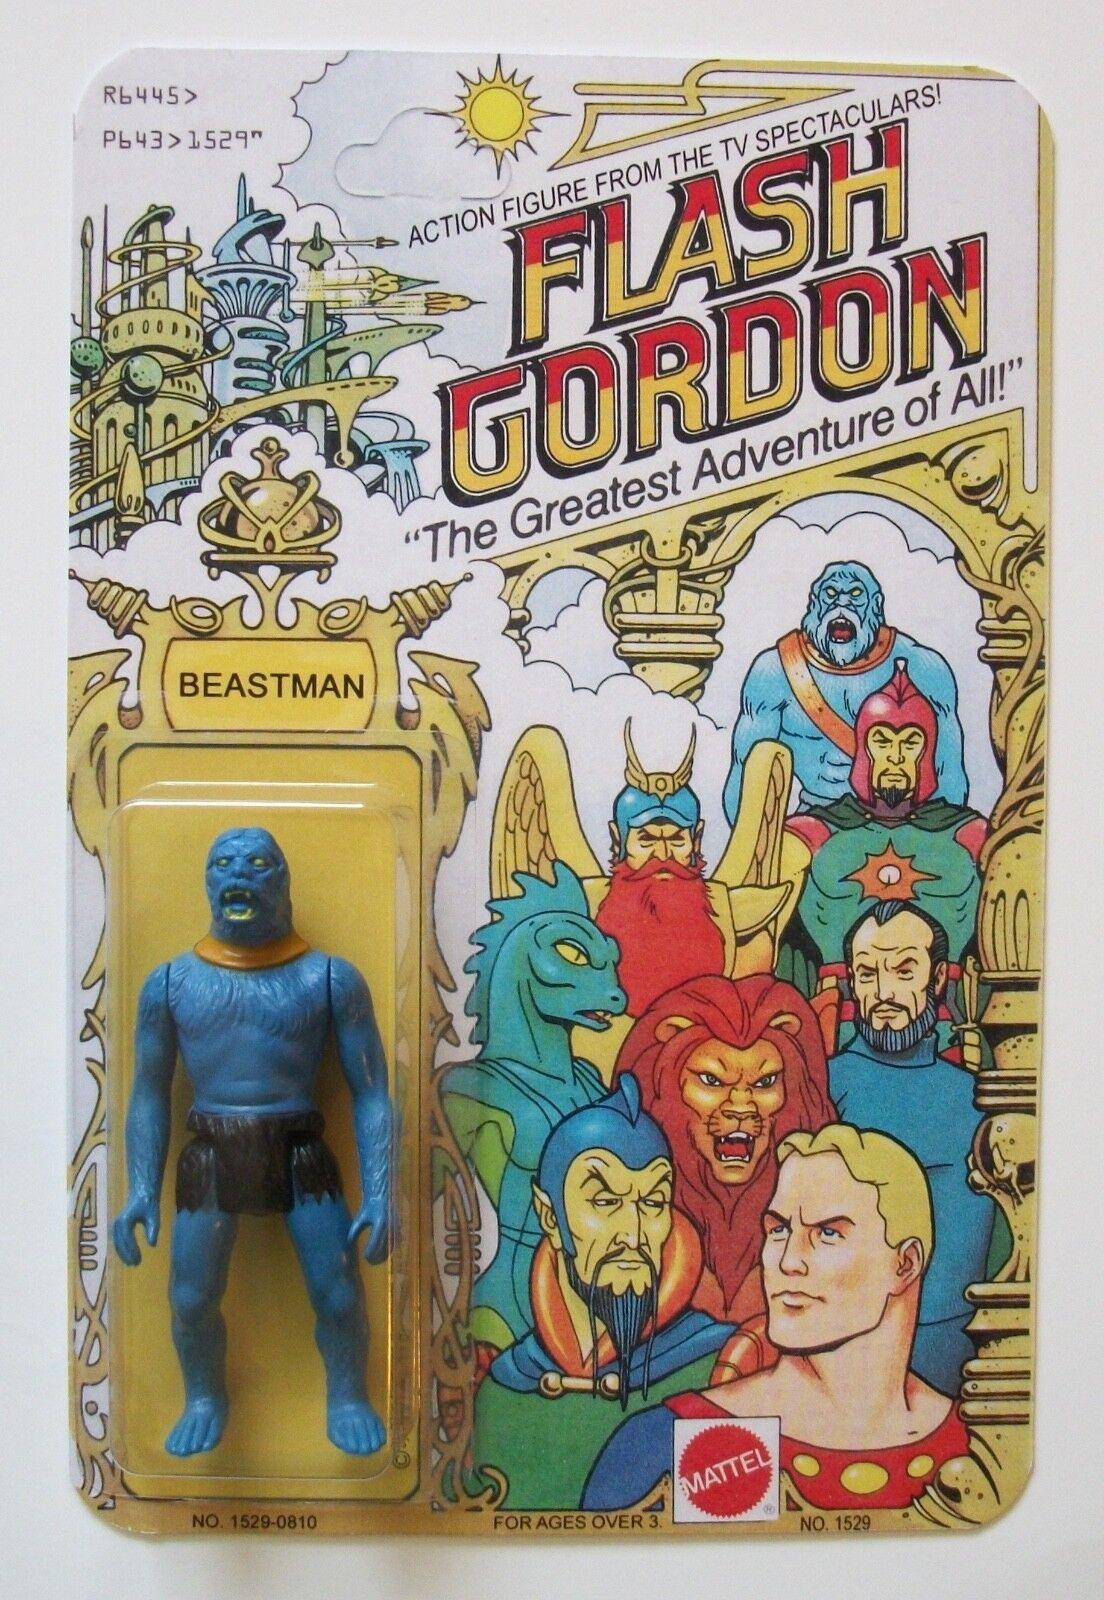 Restoration Vintage Flash Gordon 1979 Beastman 3 3 4 Action Figure MOC